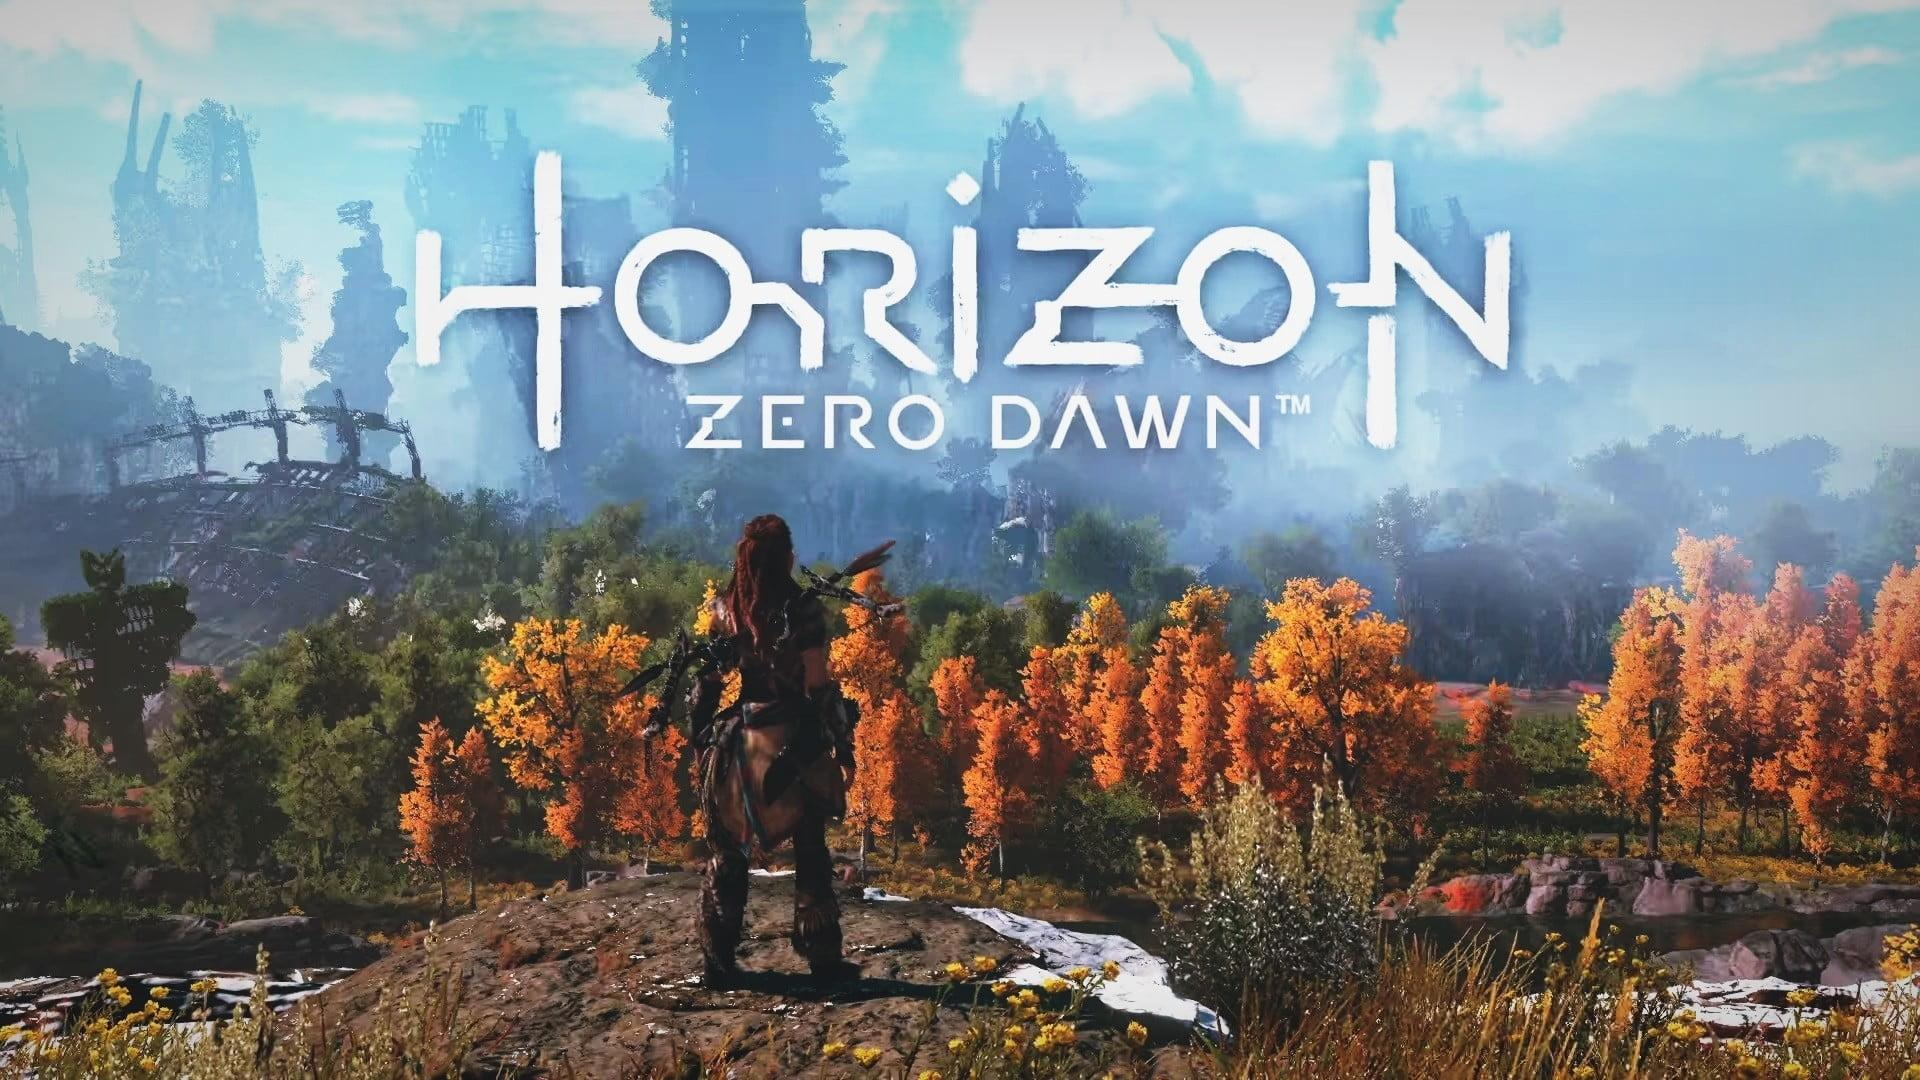 Download Horizon Zero Dawn Wallpaper Hd Backgrounds Download